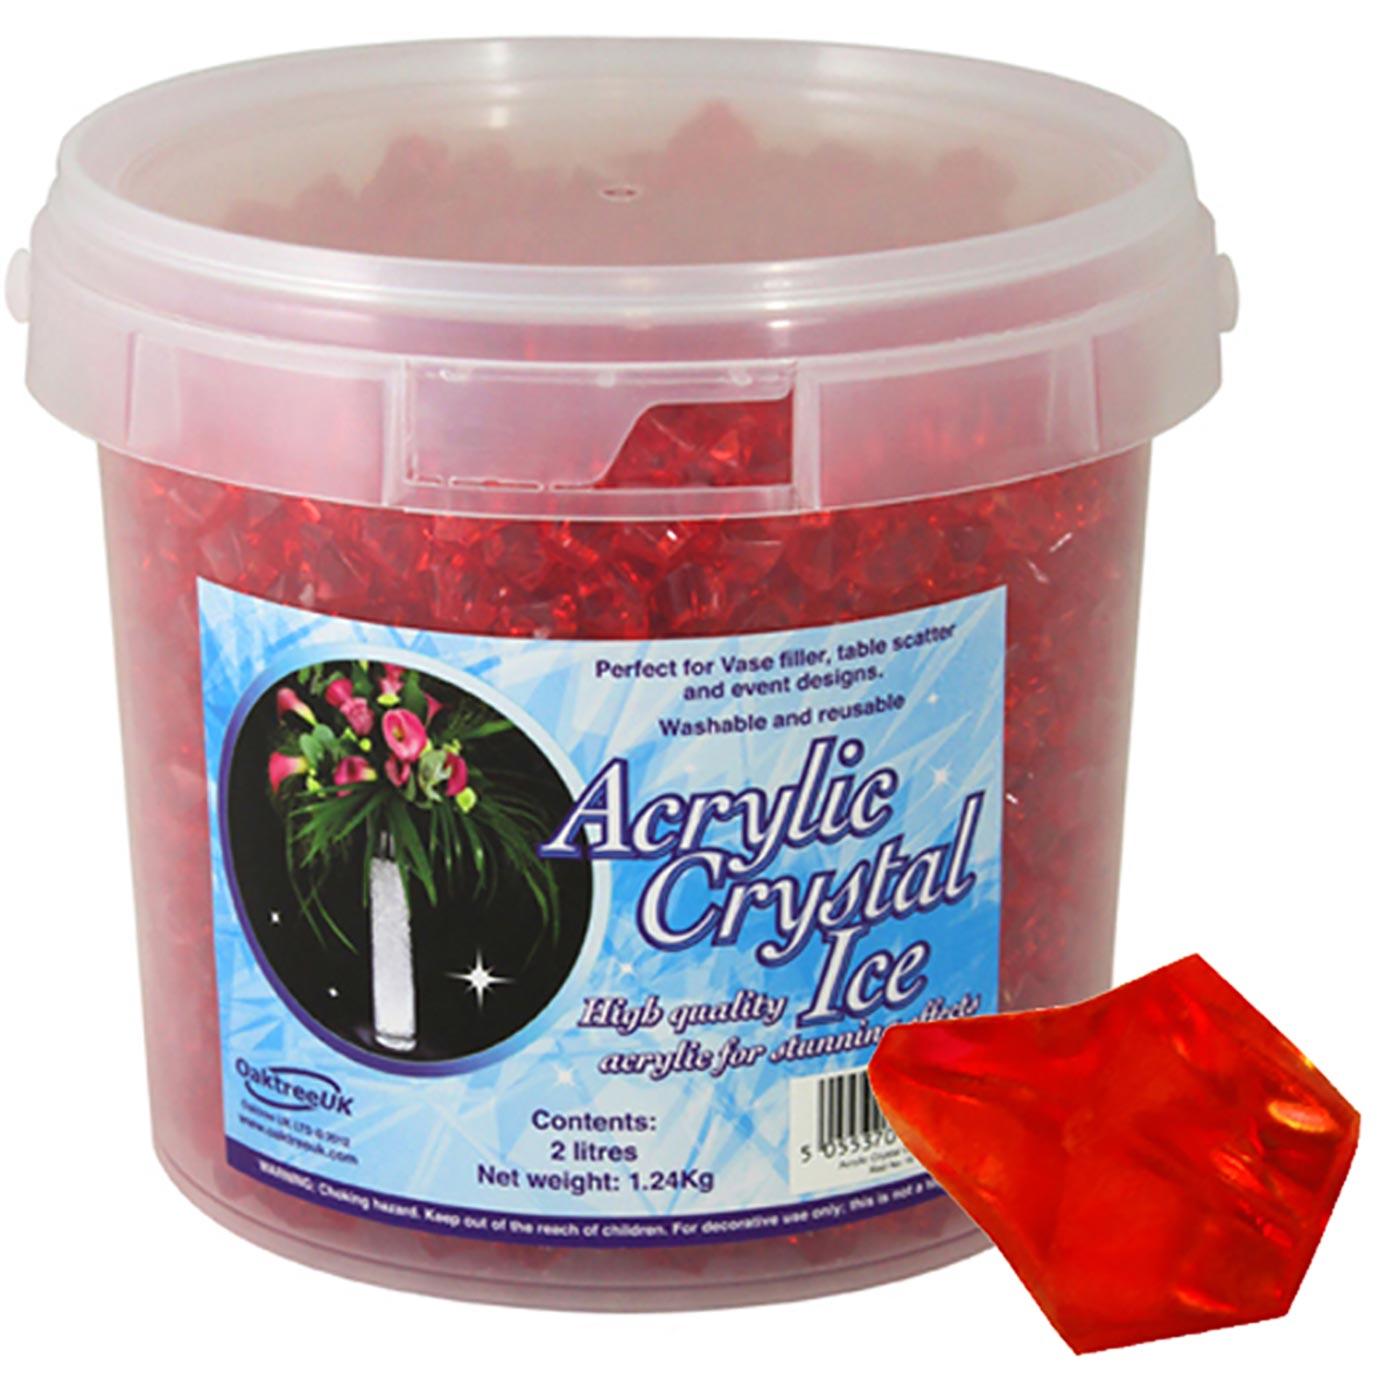 Acrylic Crystal Ice 1.4cm 2ltr 1.24Kg Red